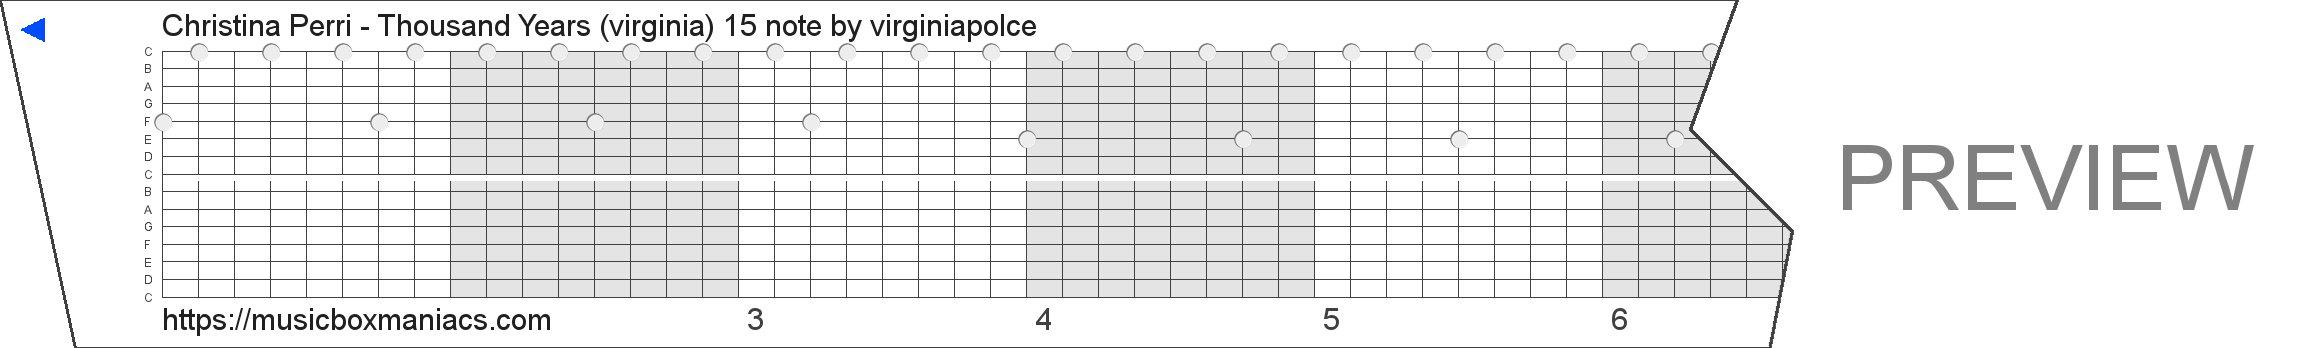 Christina Perri - Thousand Years (virginia) 15 note 15 note music box paper strip